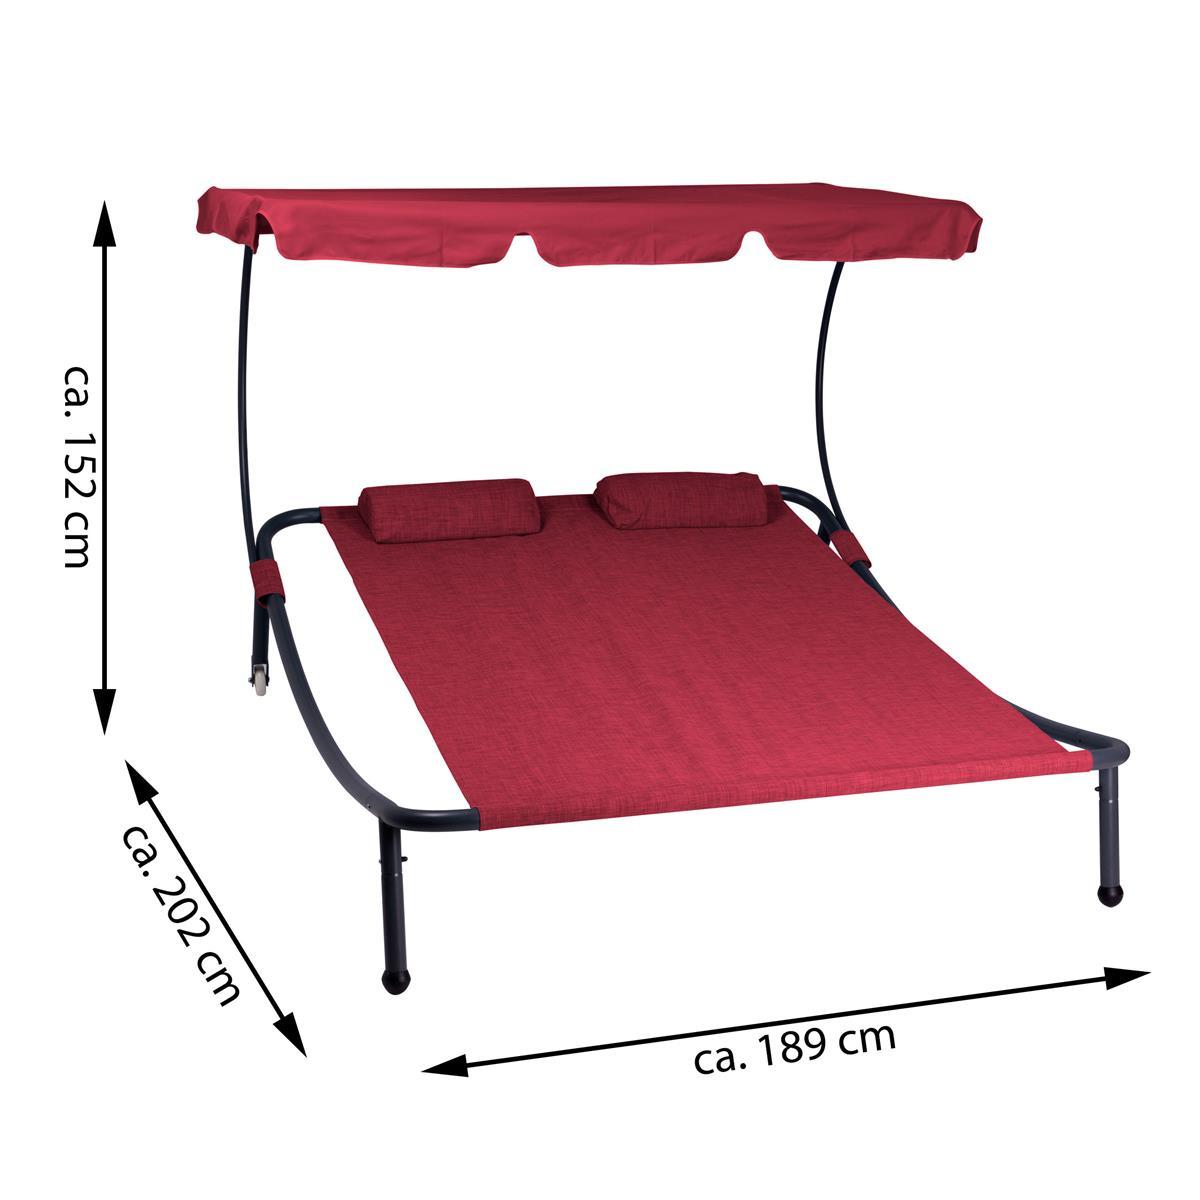 divero sonnenliege 202x189x152 mit sonnendach rot r der. Black Bedroom Furniture Sets. Home Design Ideas